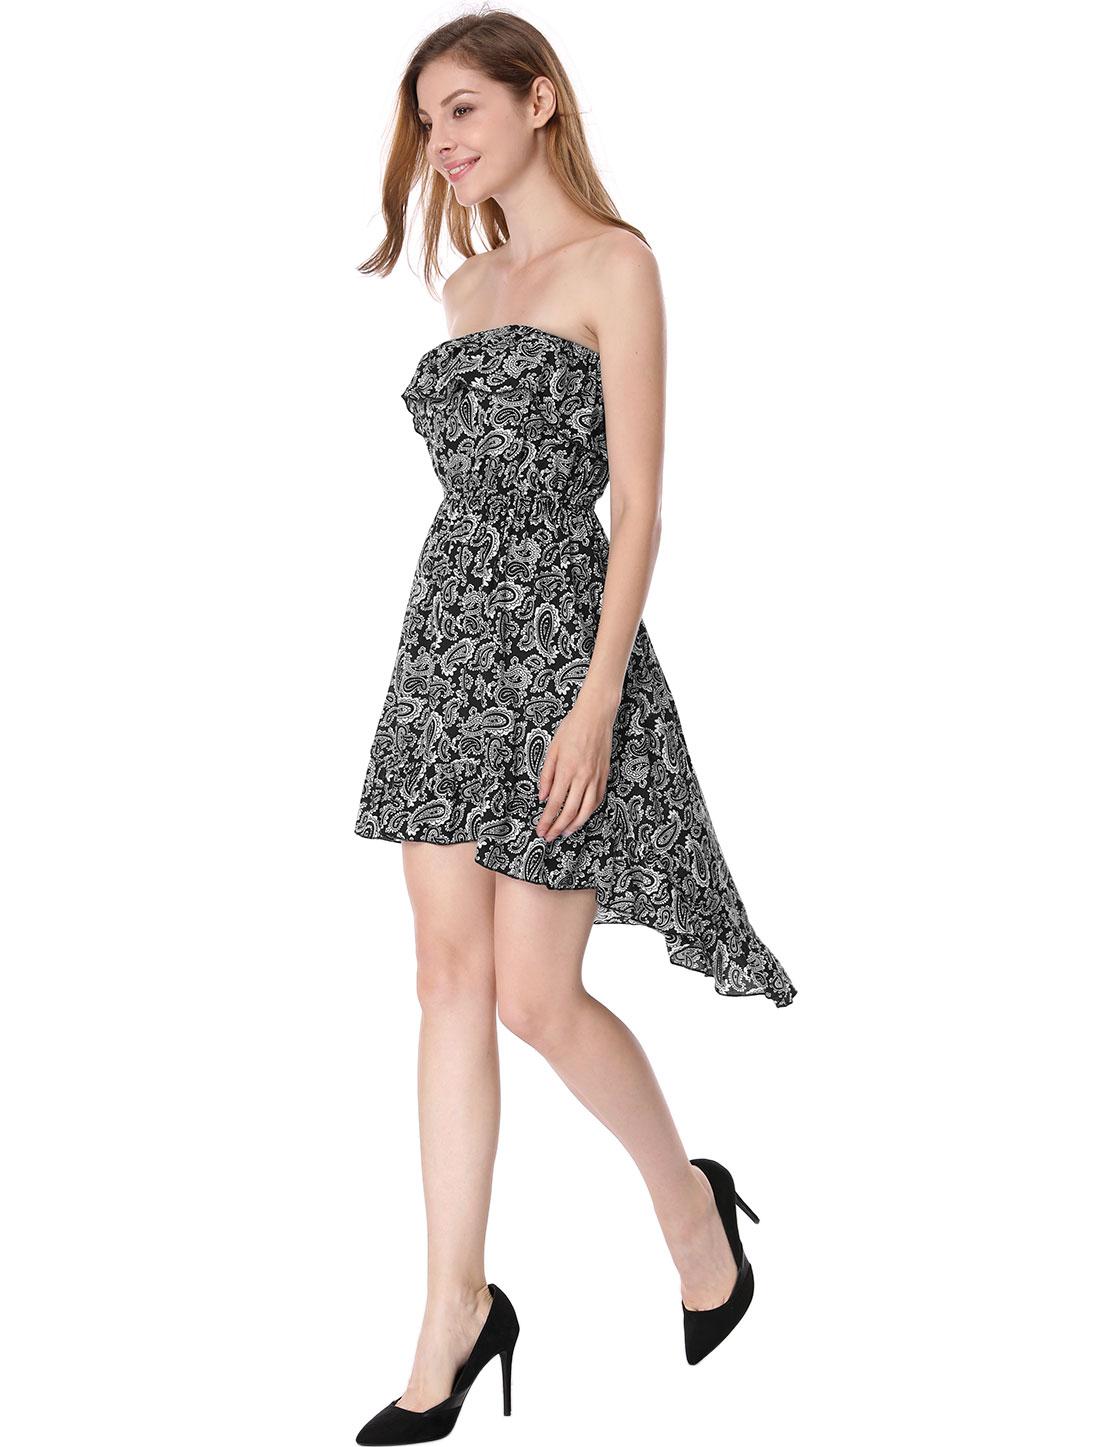 Women NEW Floral Prints Low-High Hem Design Black Knee-Length Dress XL